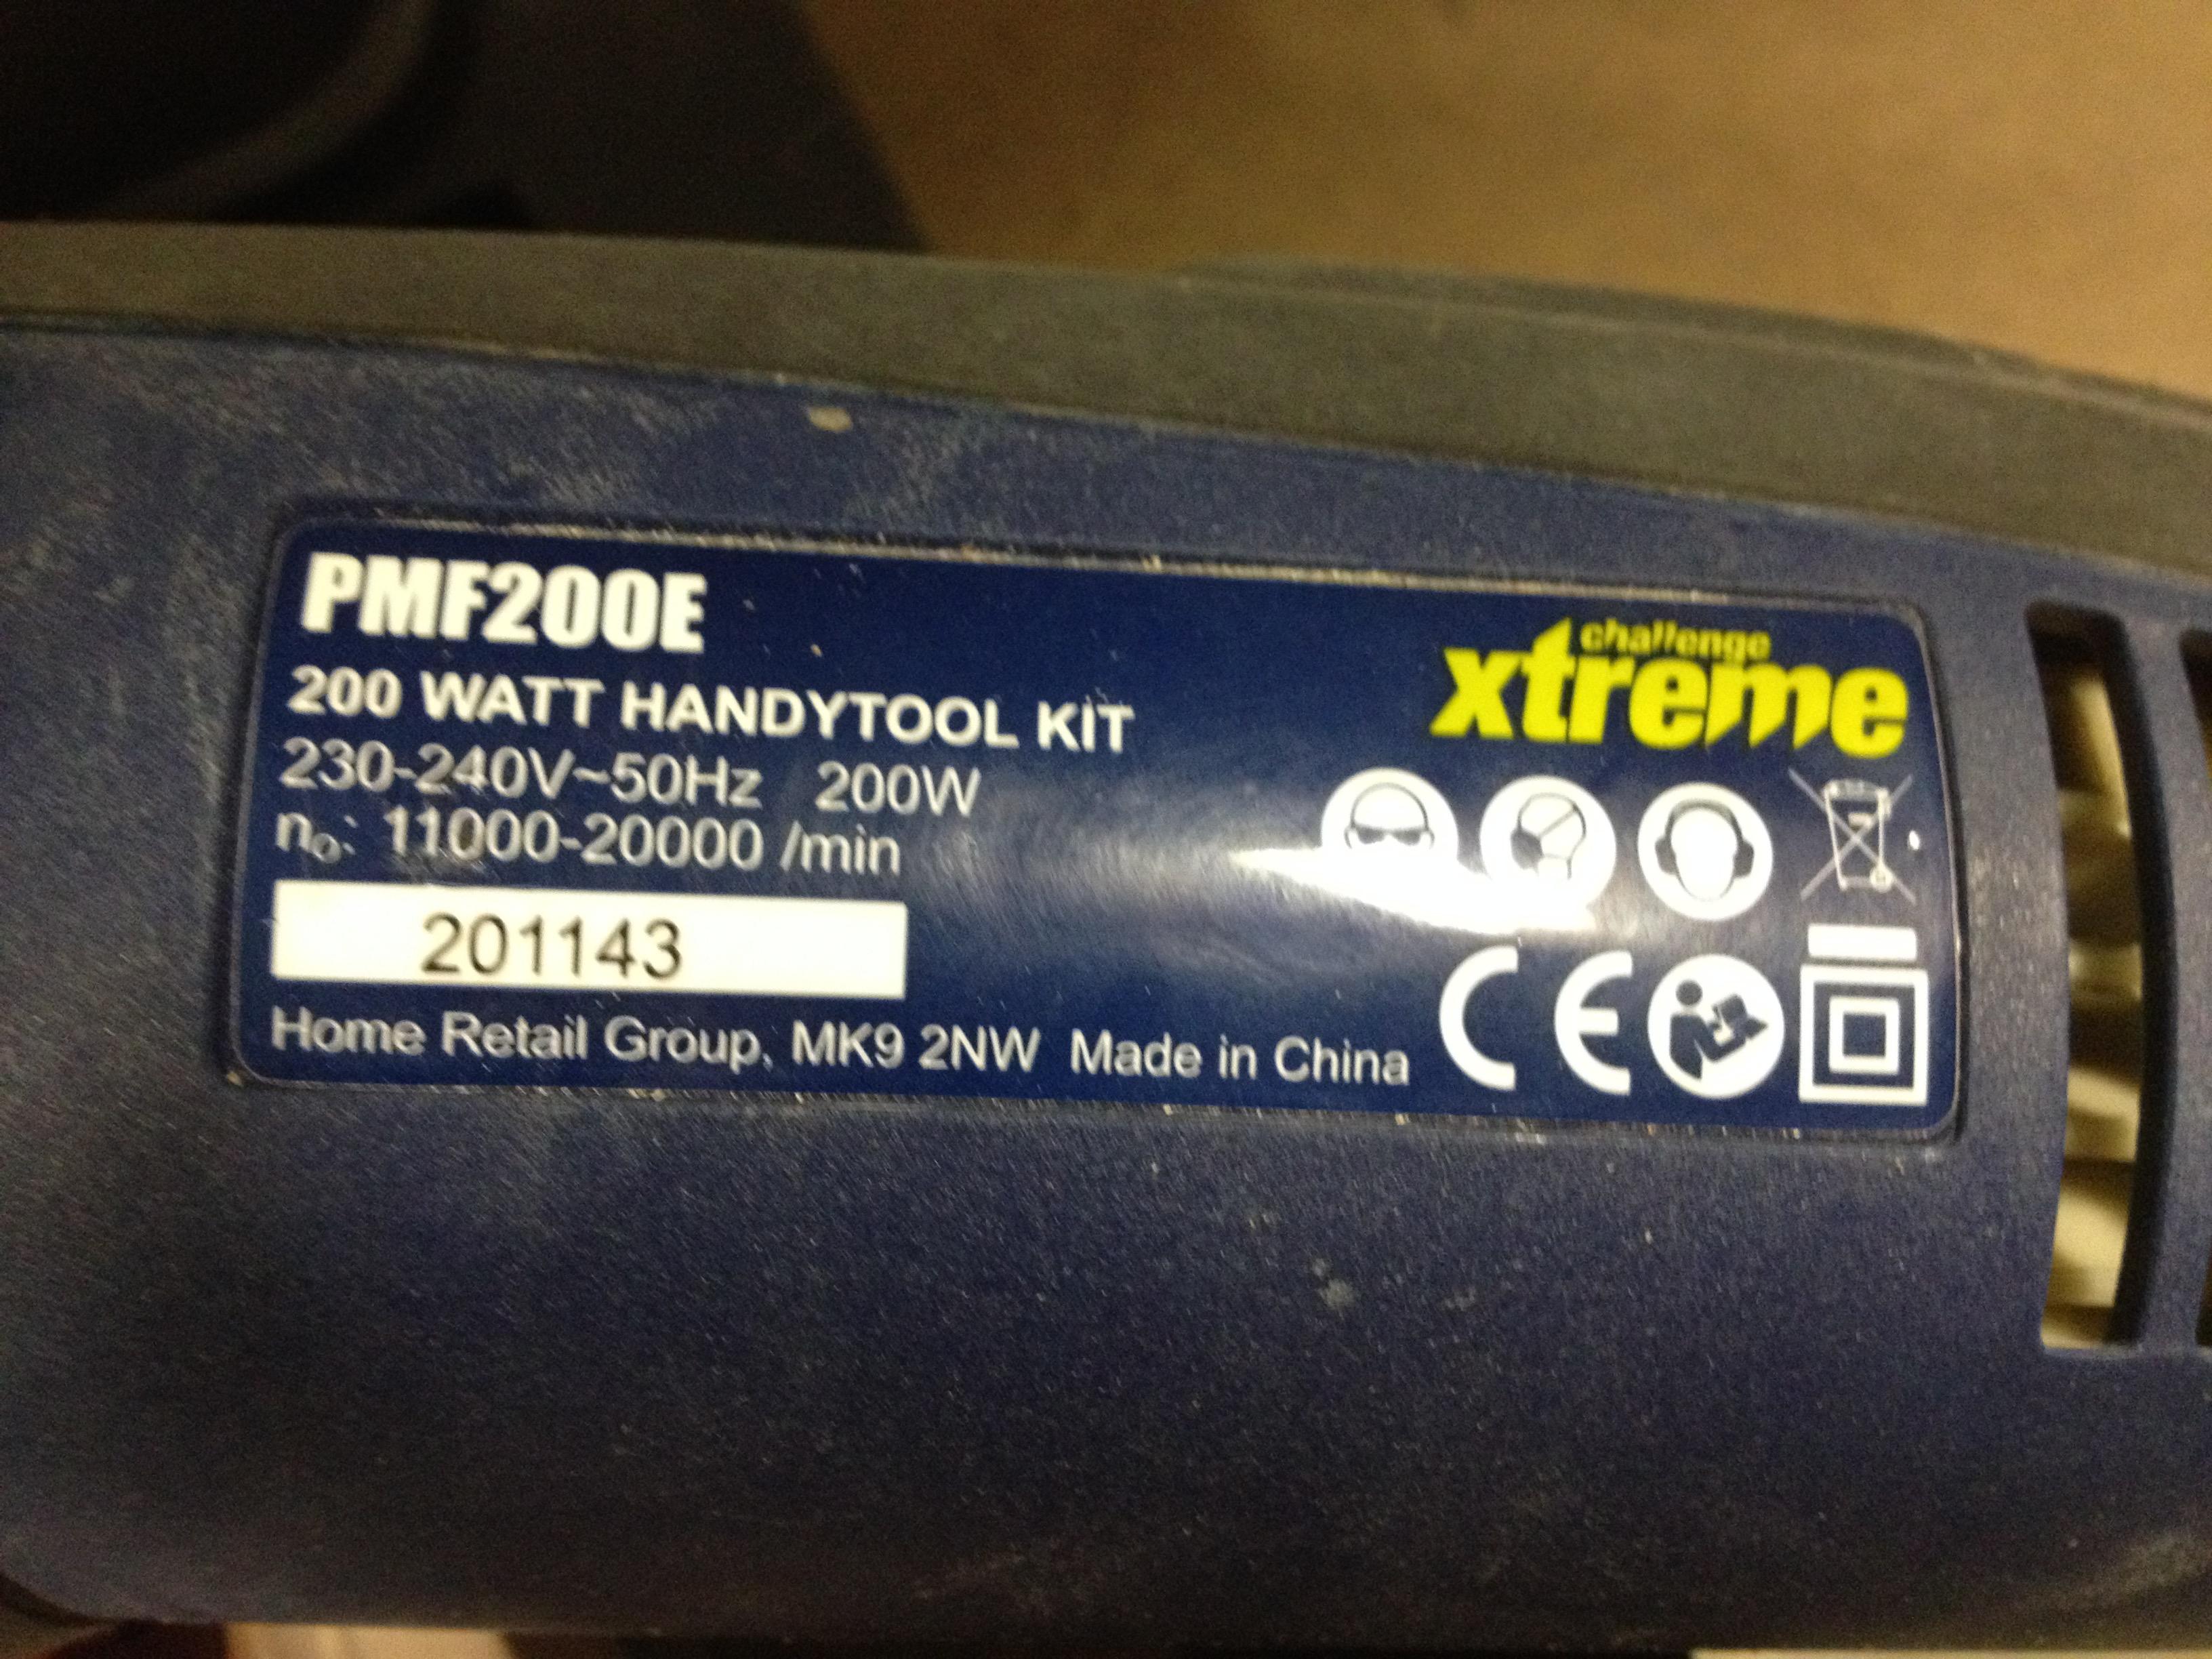 1 x Challenge xtreme Sander 200 Watt PMF200E - Image 2 of 2